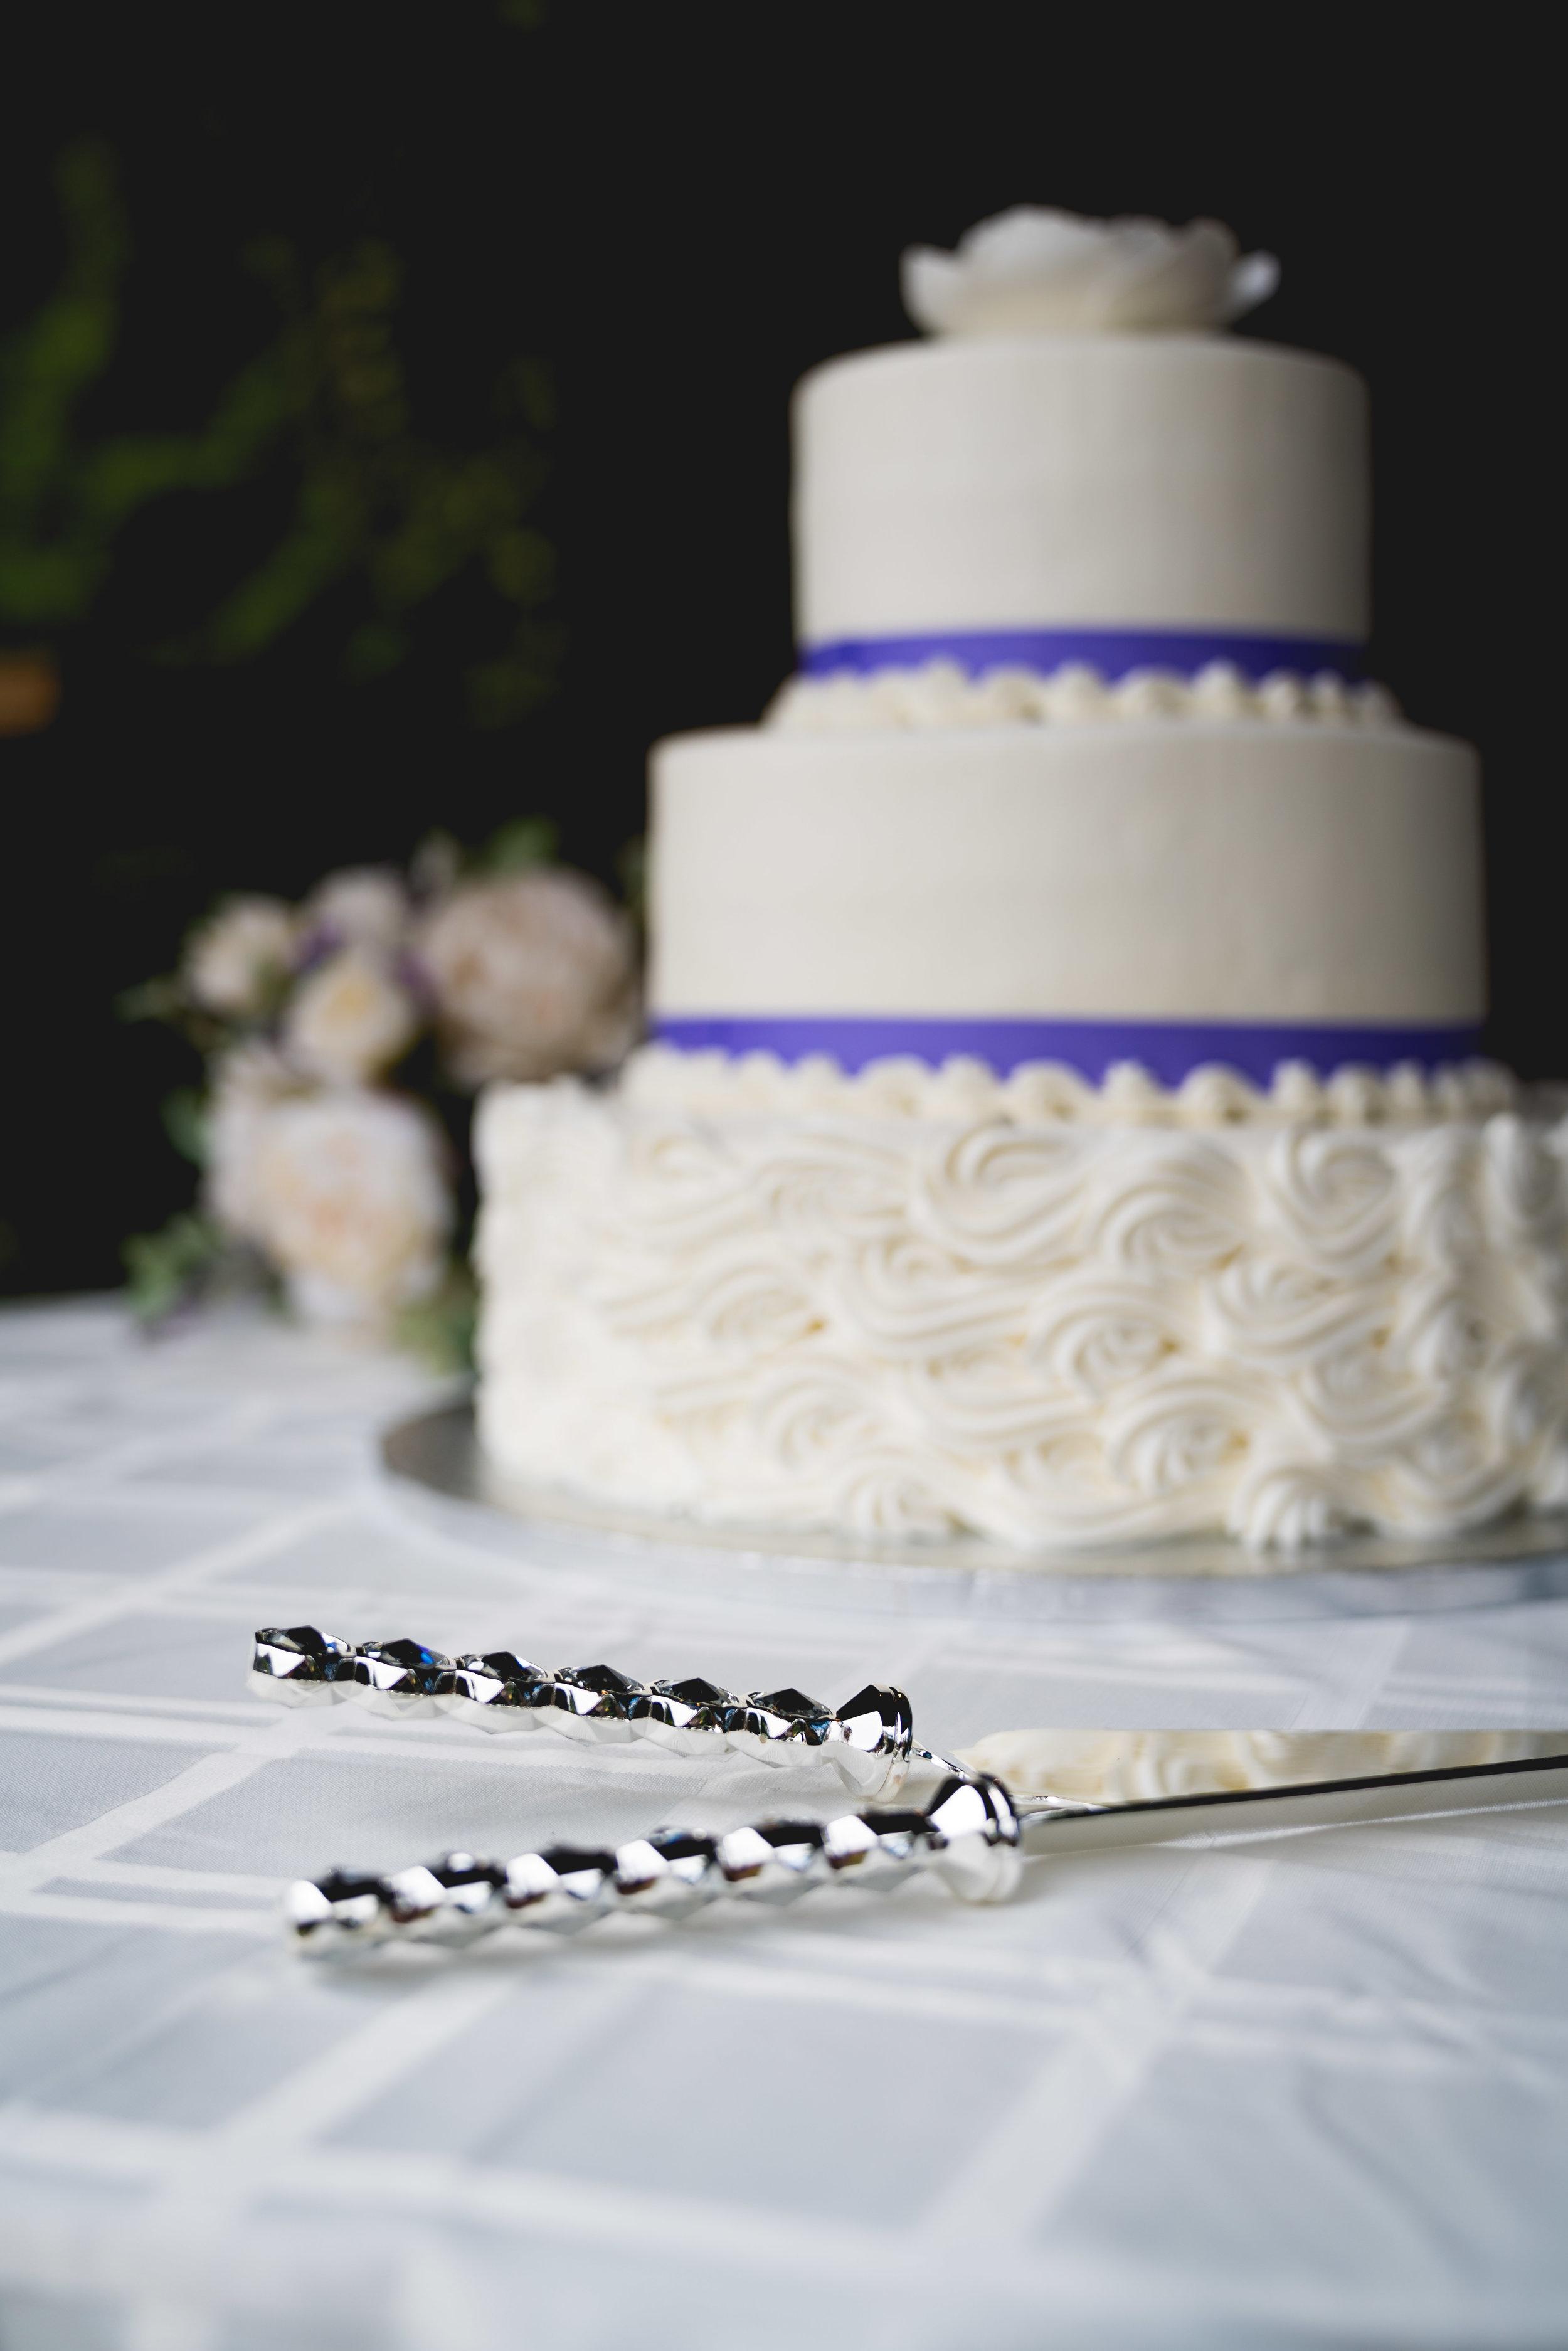 Wedding Reception at Viewpoint at Buckhorn Creek in Greenville, SC